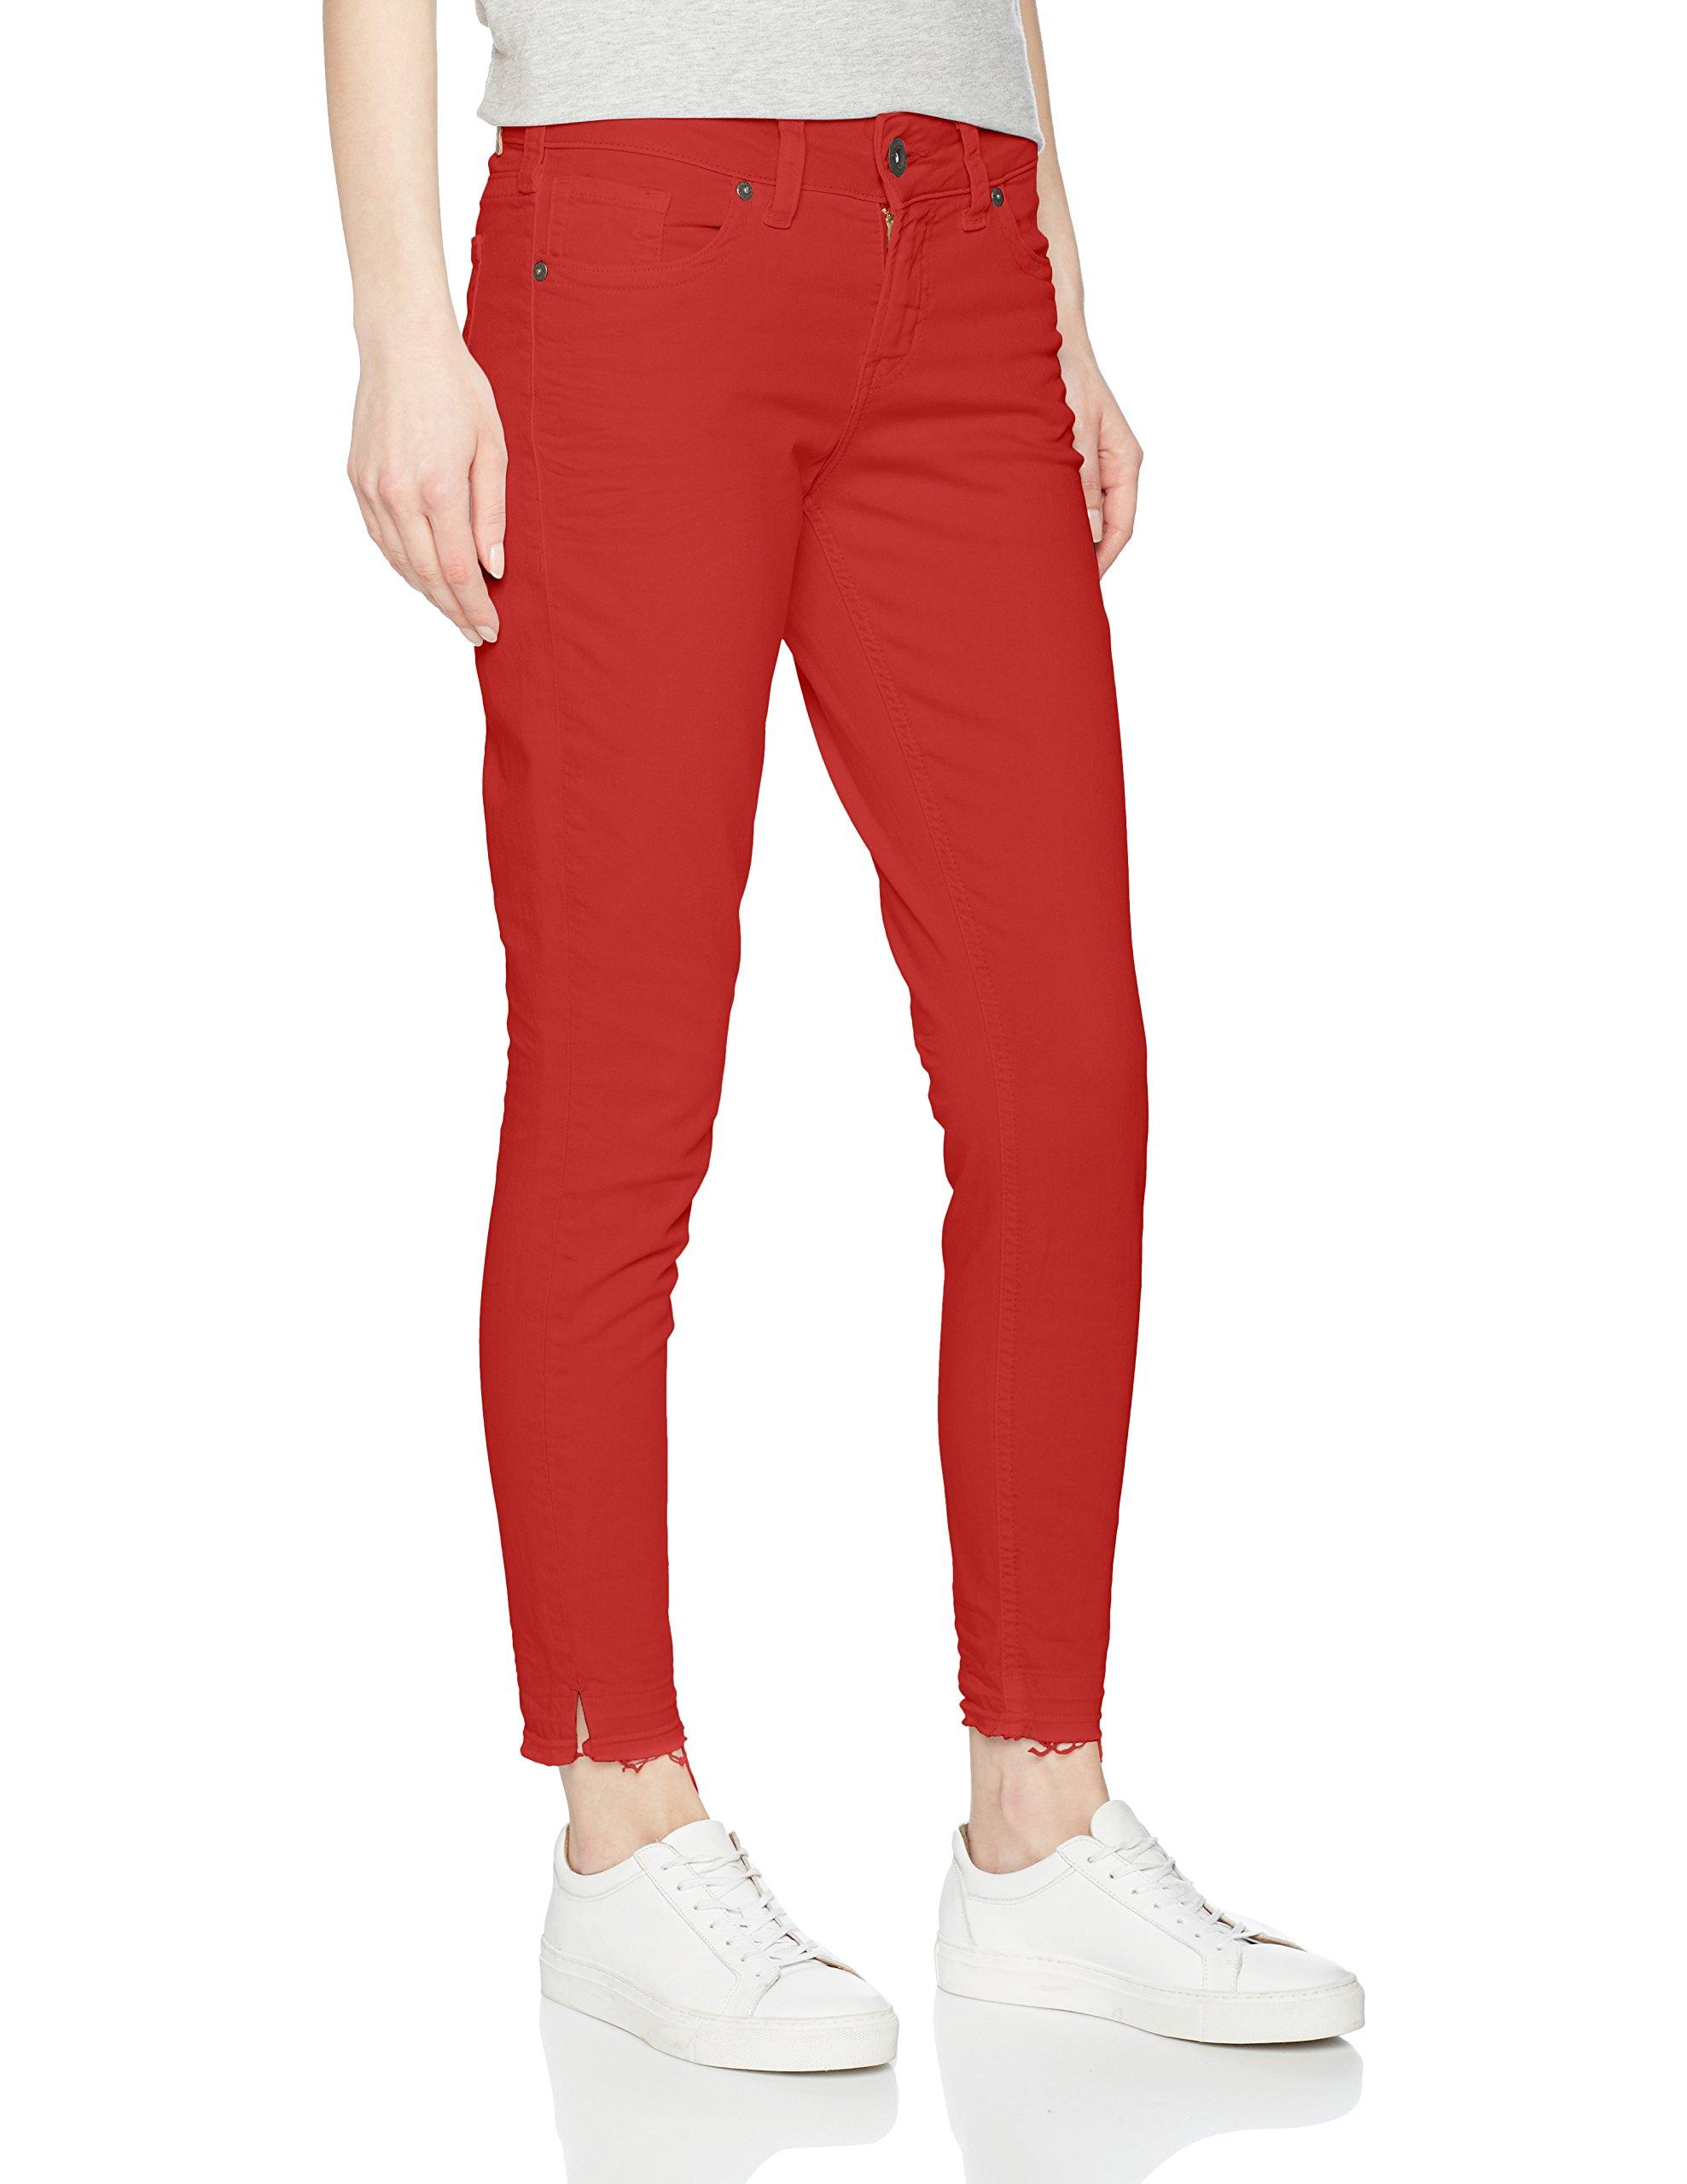 Silver Red28w Elyse 27l Jeans Jean SkinnyRougeburnt X Femme 4A3Rj5L